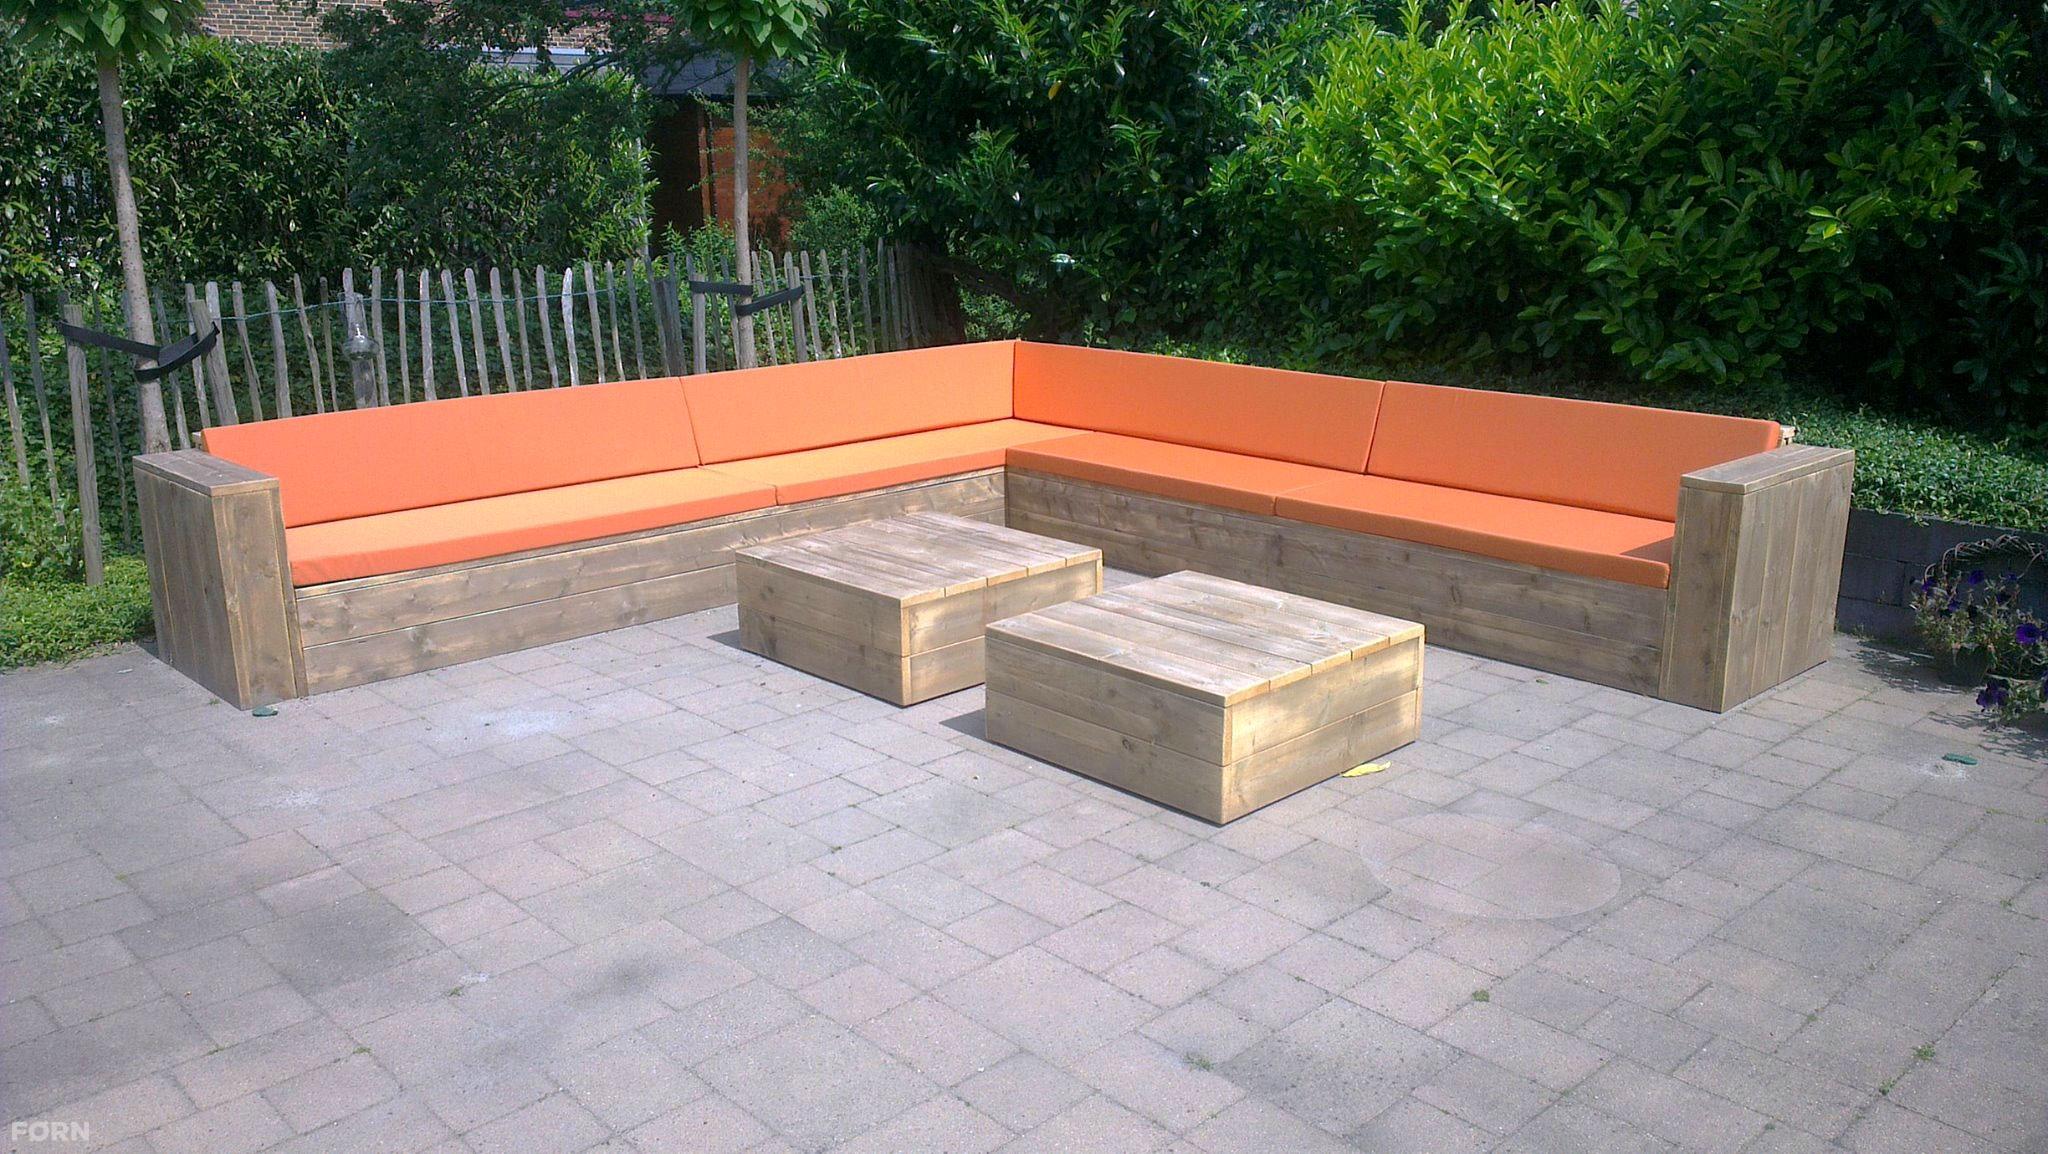 Steigerhouten loungebank l vorm op maat gemaakt - Bank terras hout ...